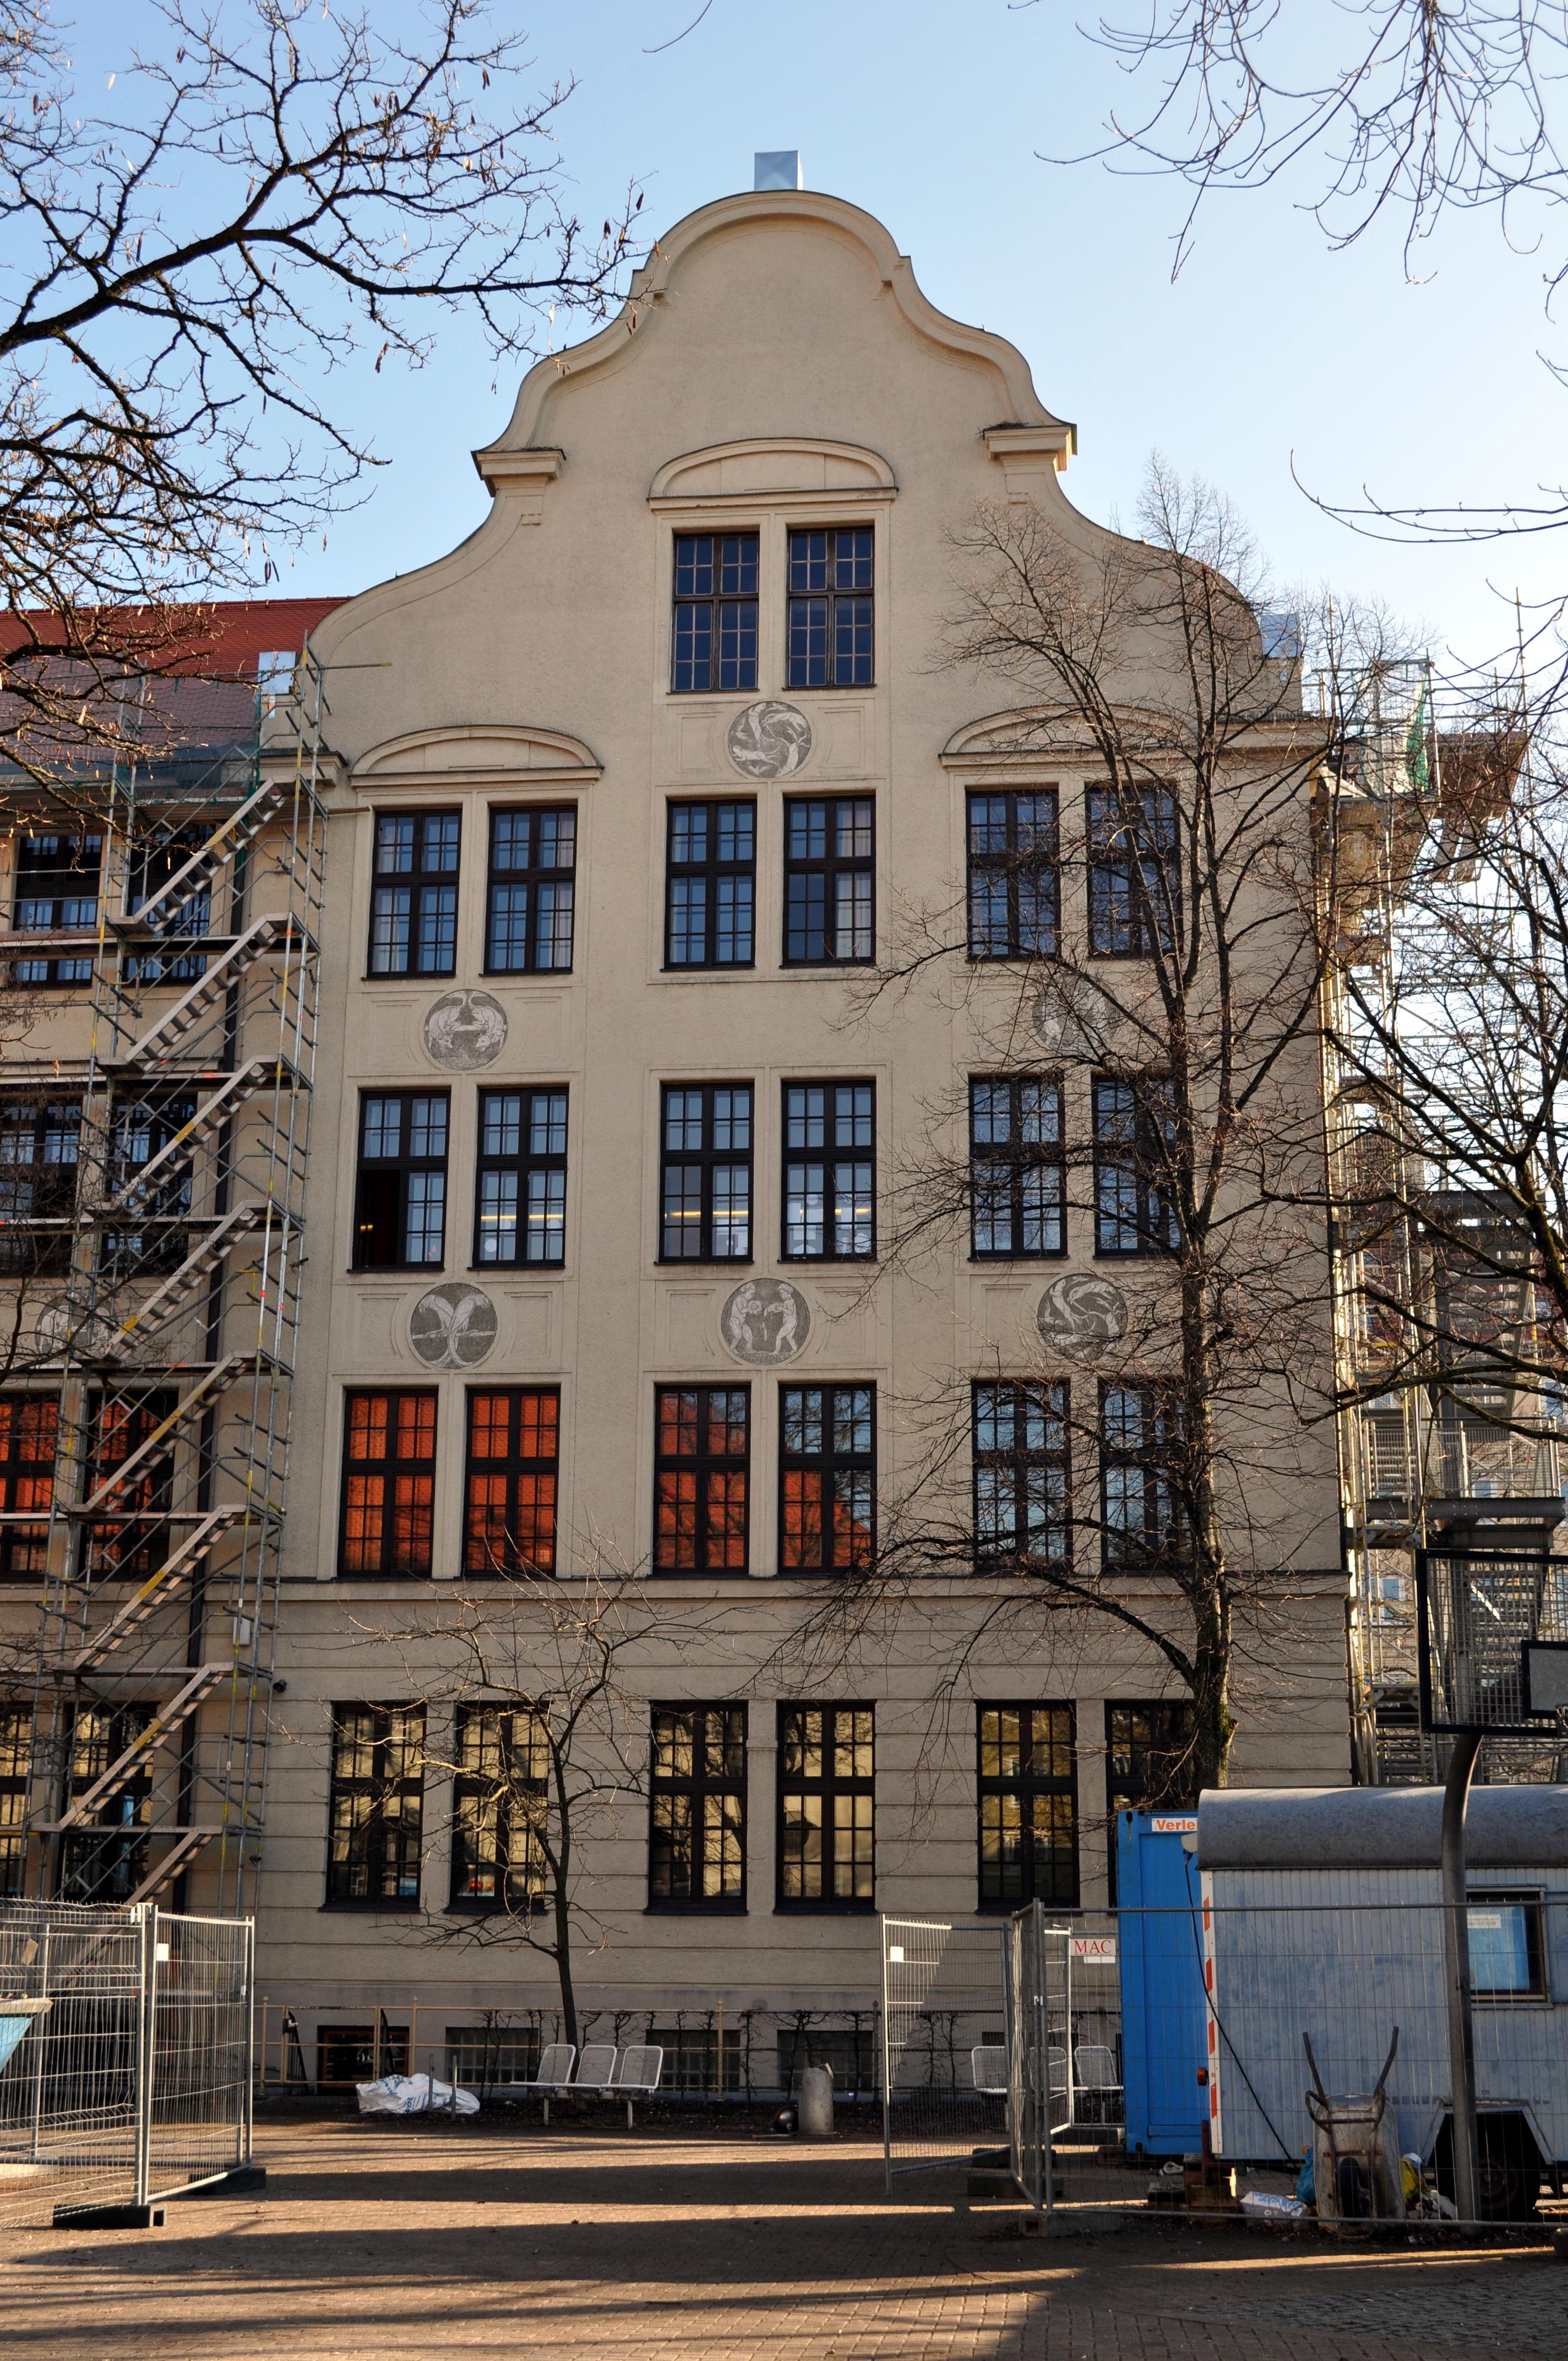 FileHermann Frieb Realschule Rckgebude 2JPG